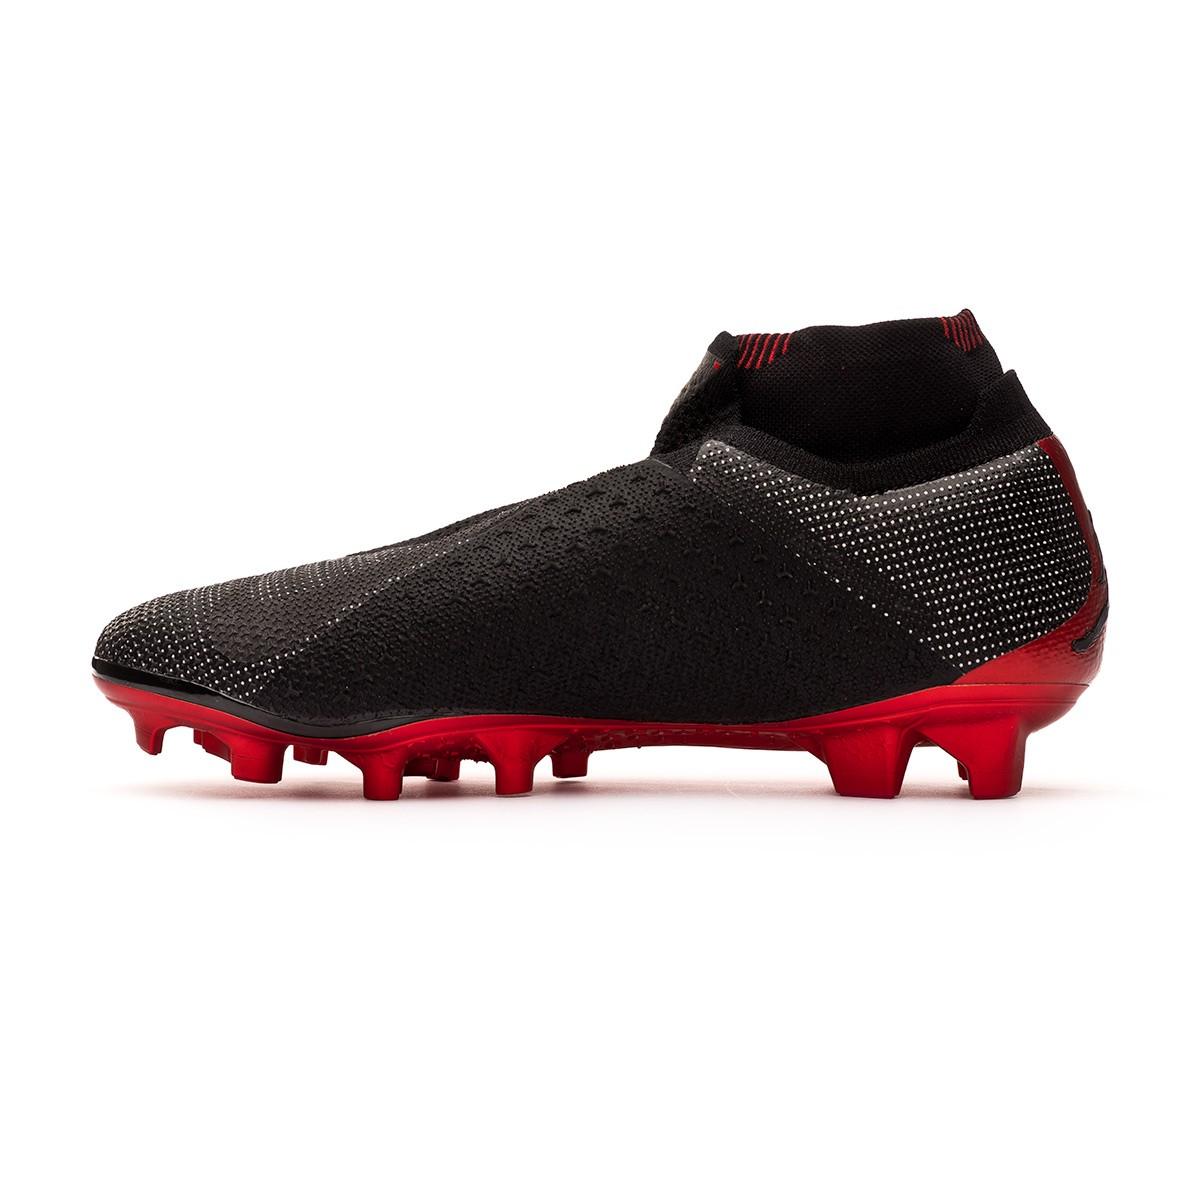 jordan football boots